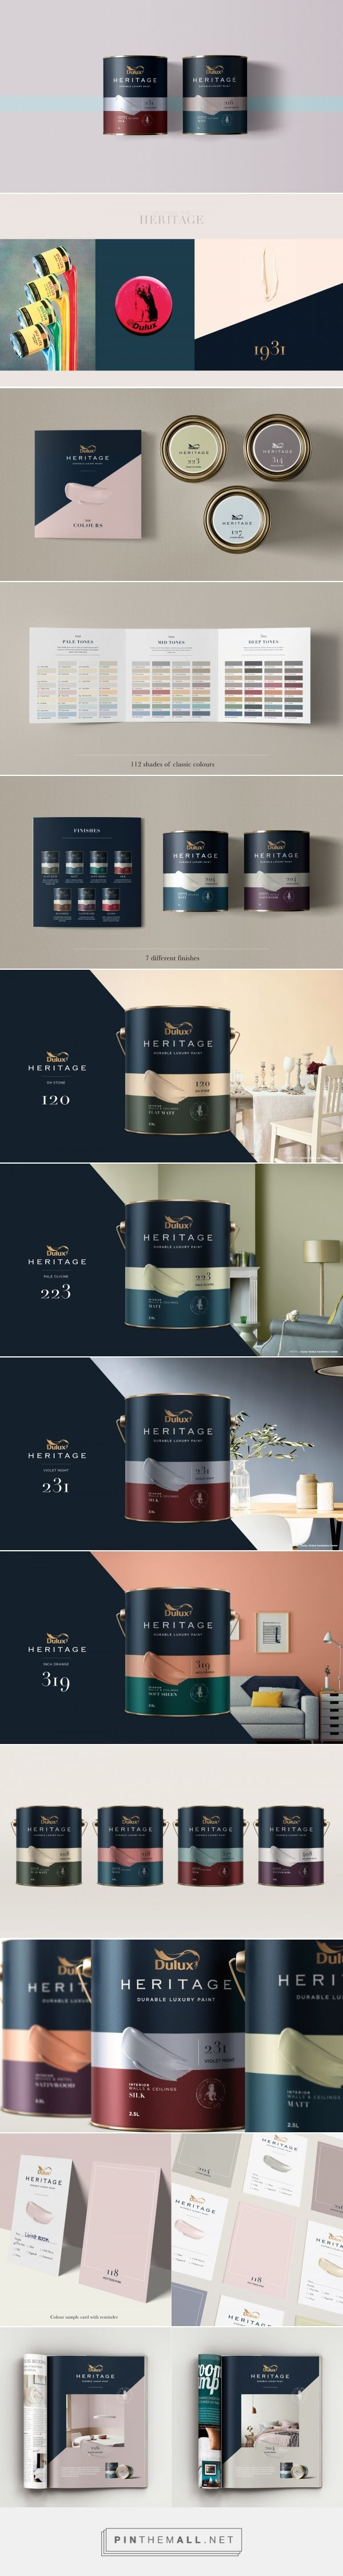 Dulux Heritage paint packaging design by Thnadech Kummontol - http://www.packagingoftheworld.com/2017/02/dulux-heritage-concept.html